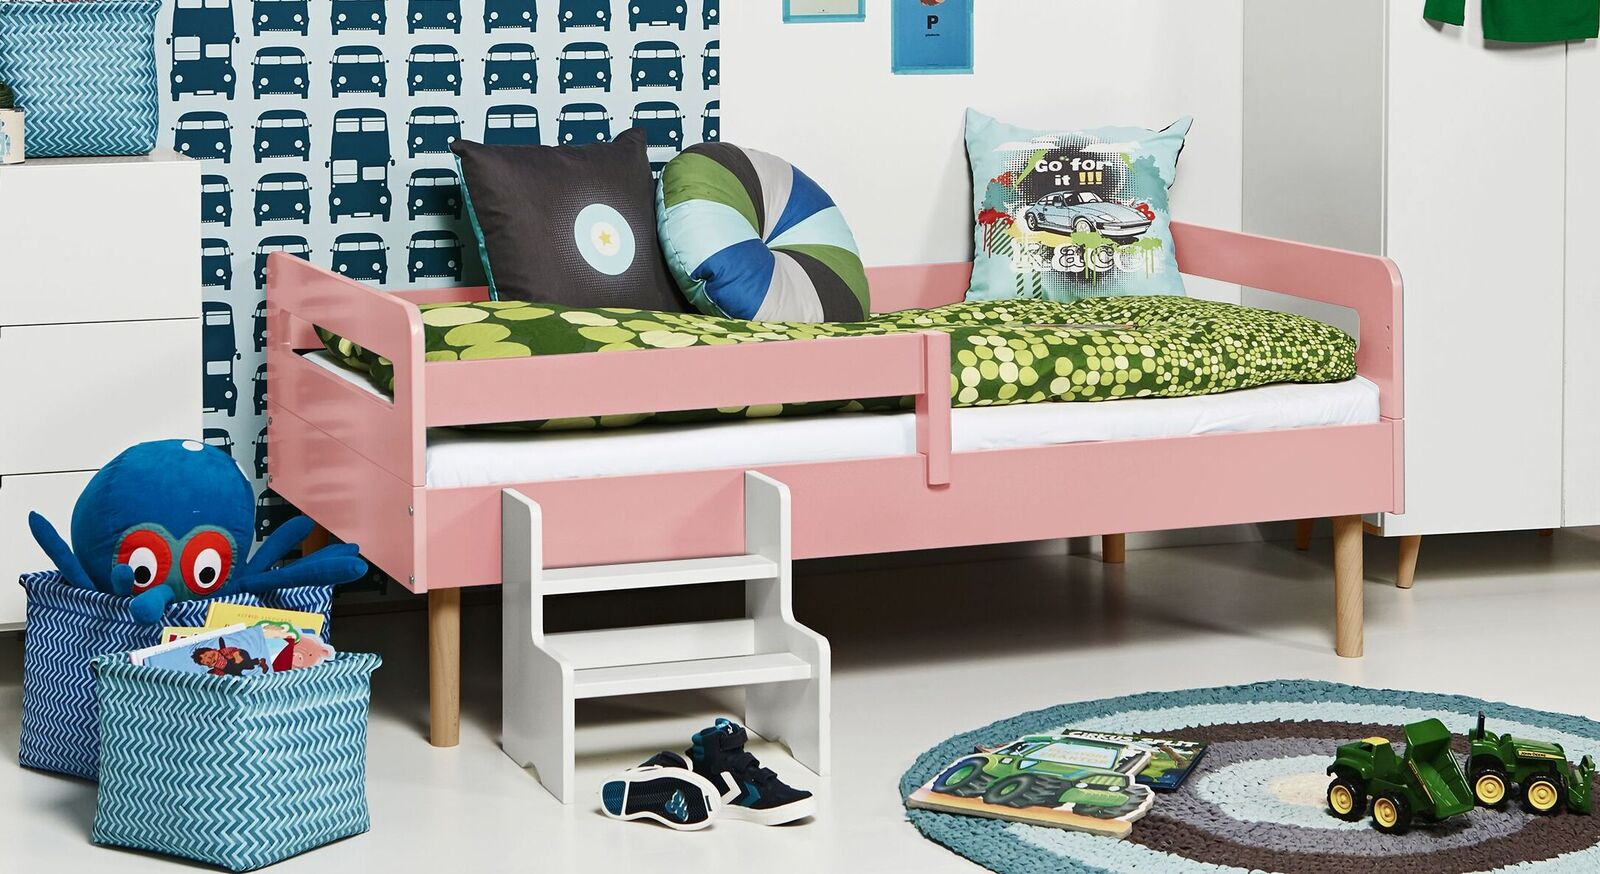 Modernes Kinderbett Kids Town Retro aus rosanem MDF